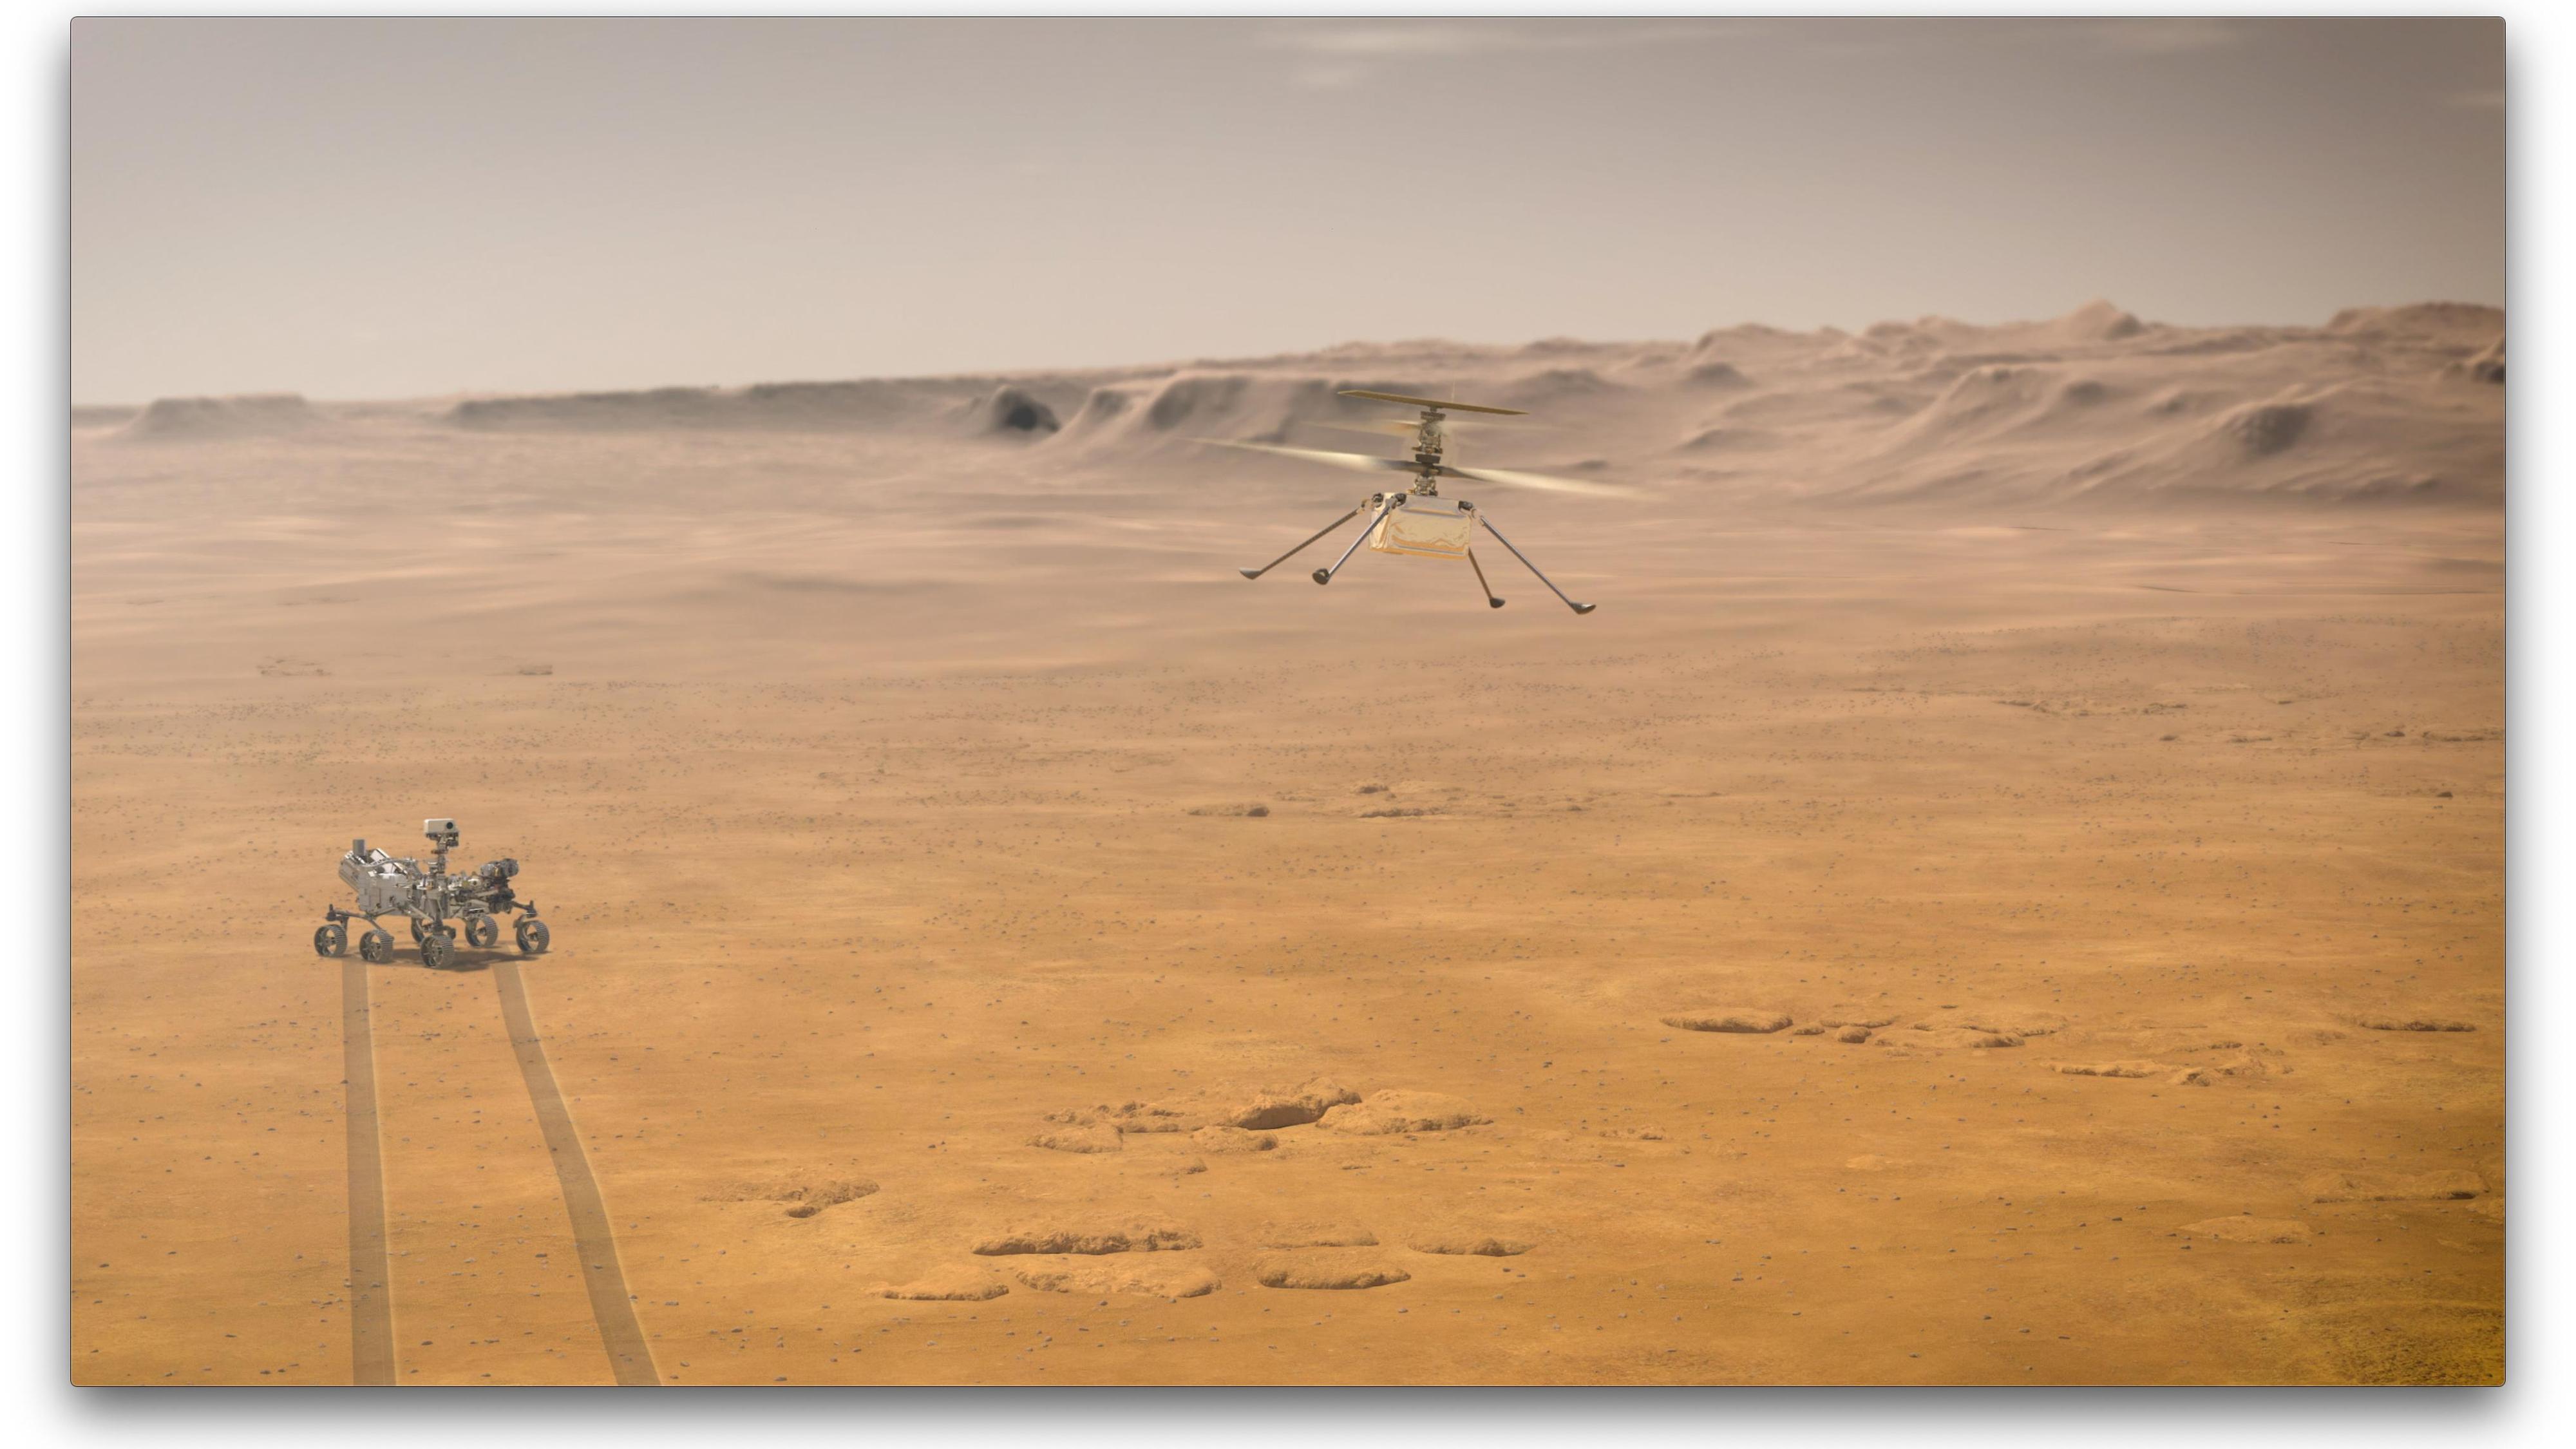 Et stort sprang for et lite helikopter